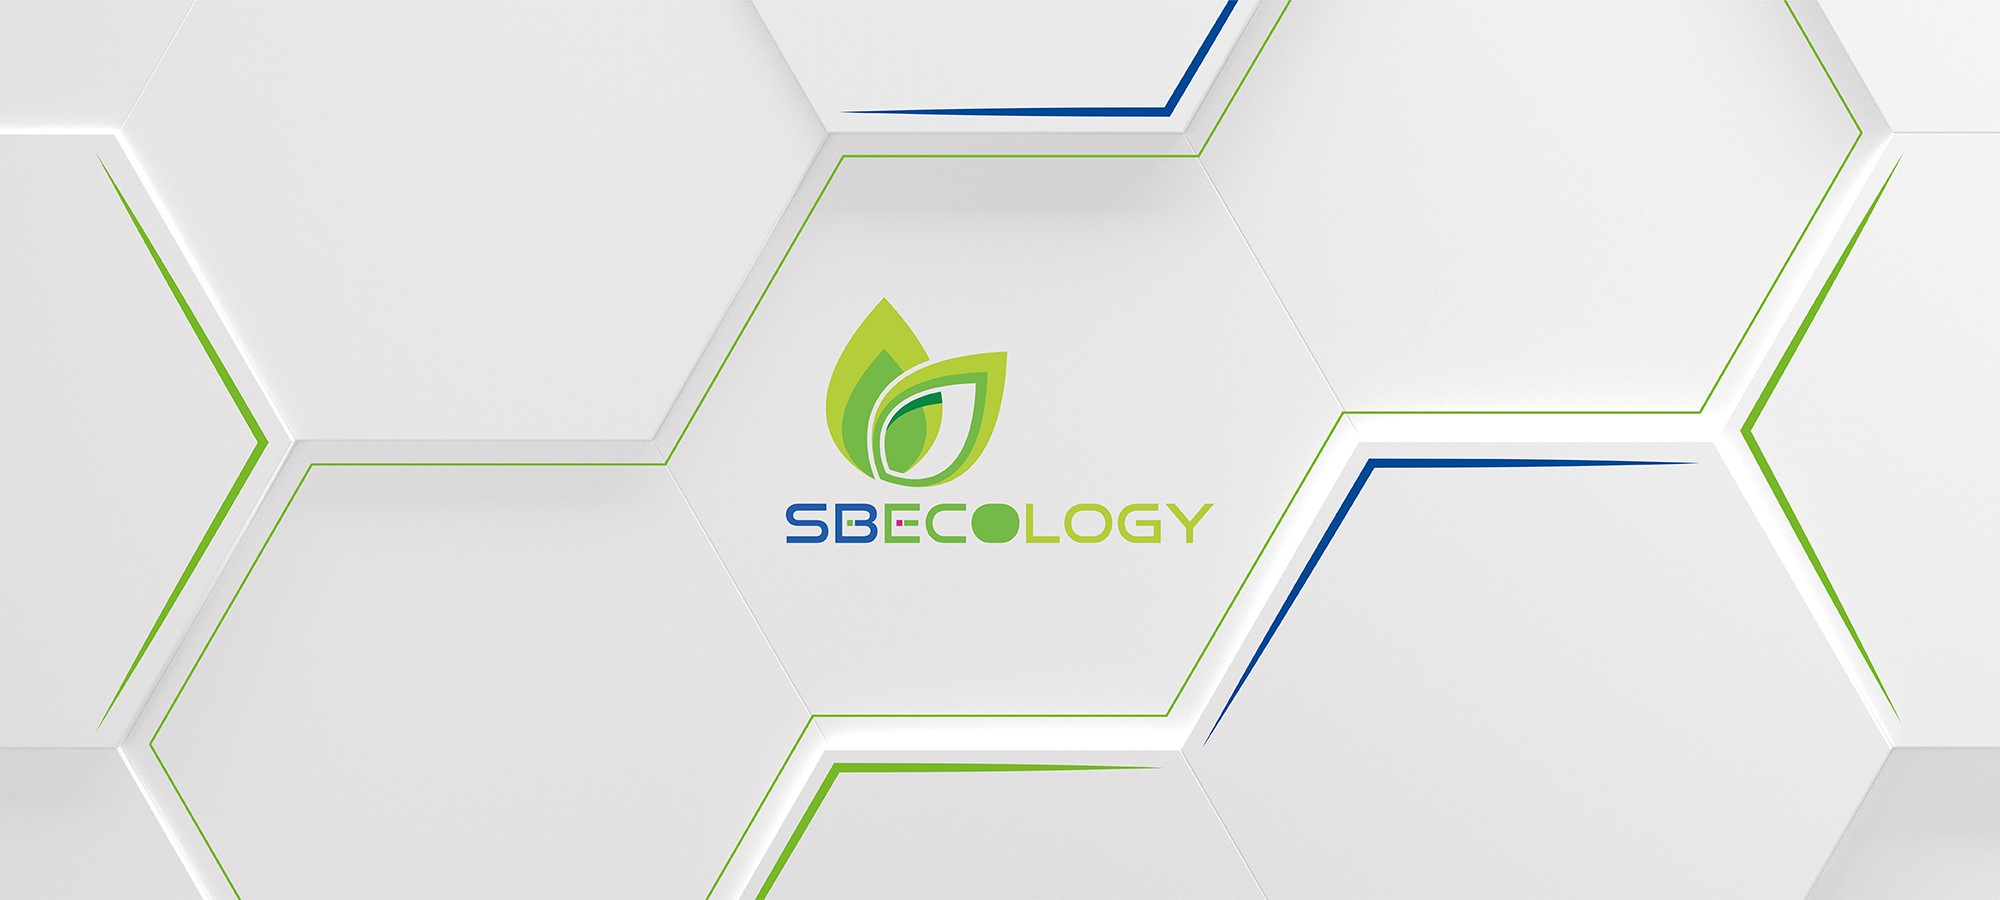 slide Sb ecology